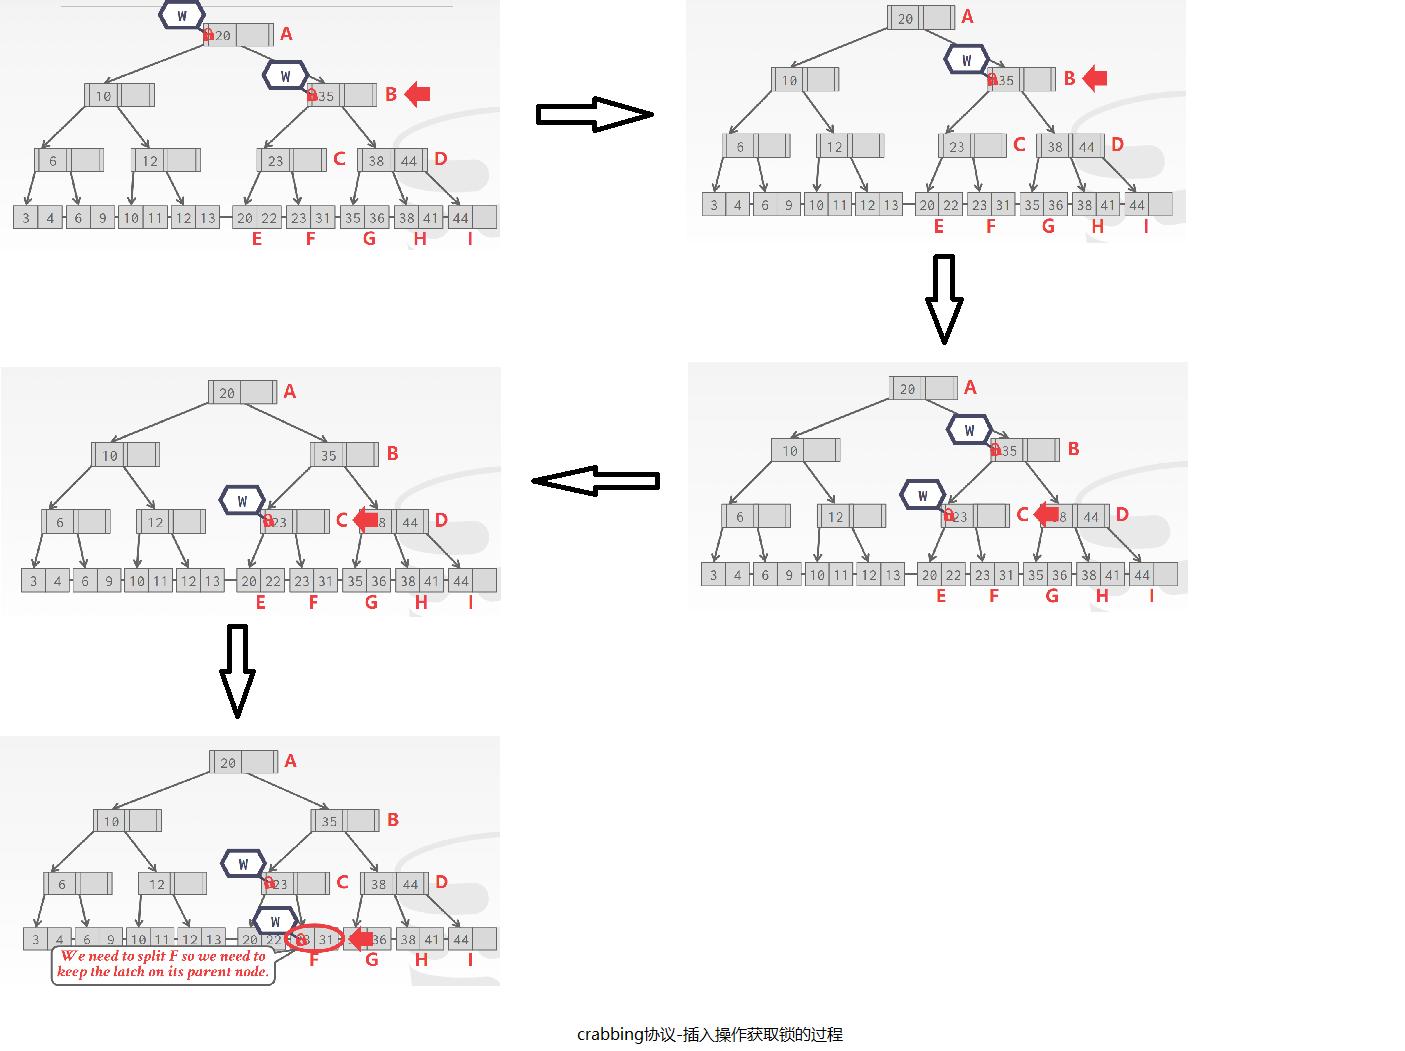 lab2_6-crabbing_protol_insert.png